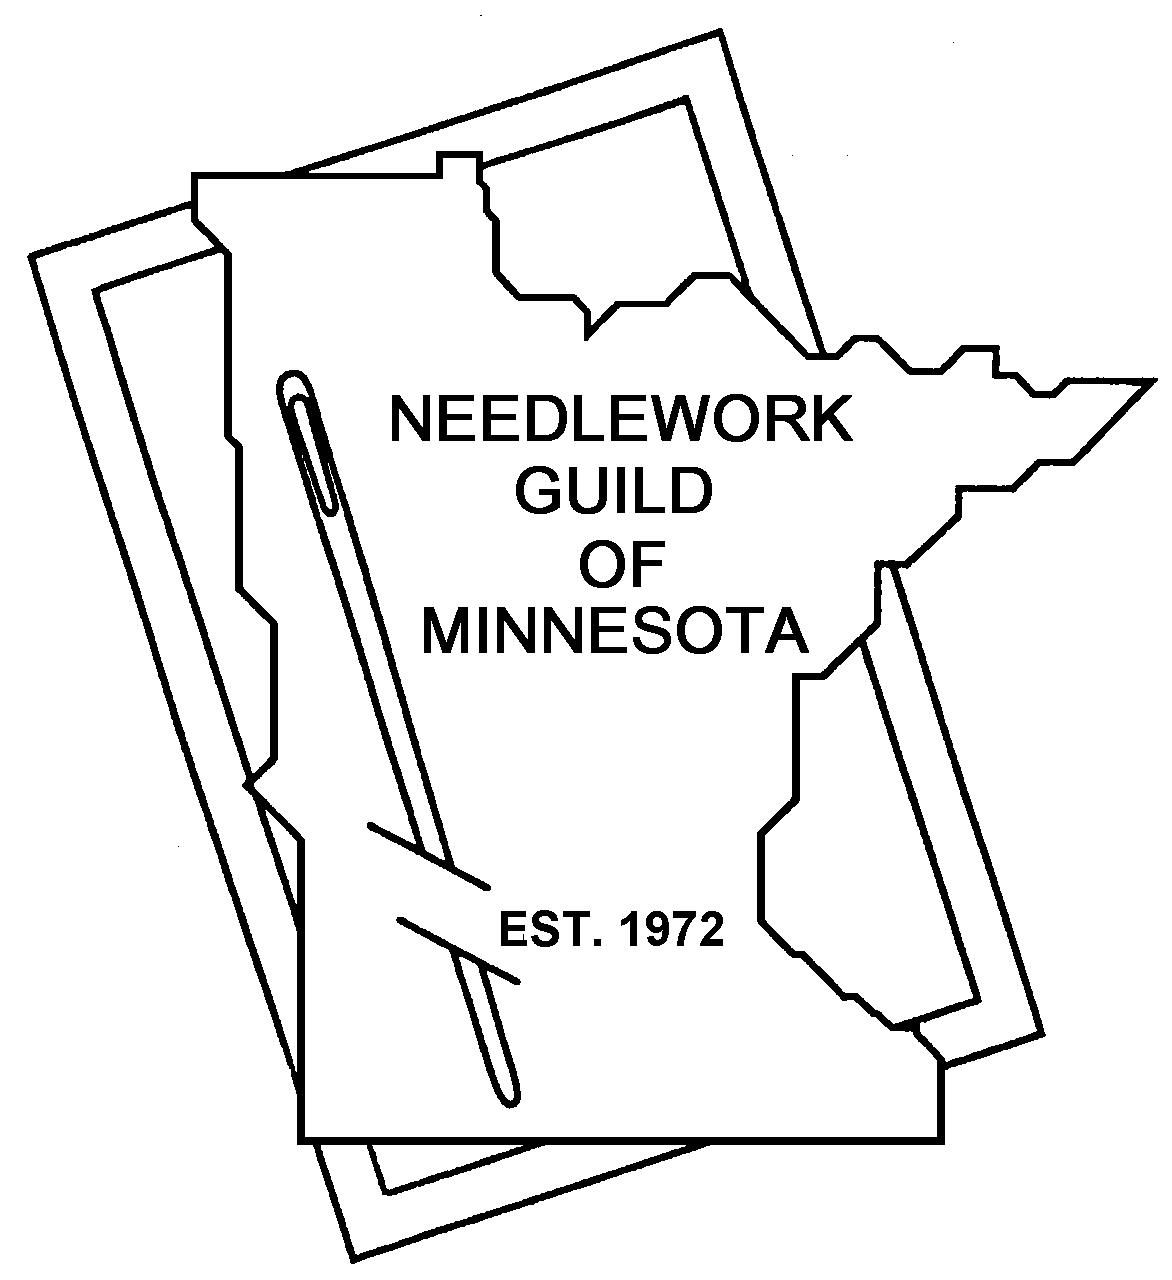 Needlework Guild of Minnesota | Est. 1972